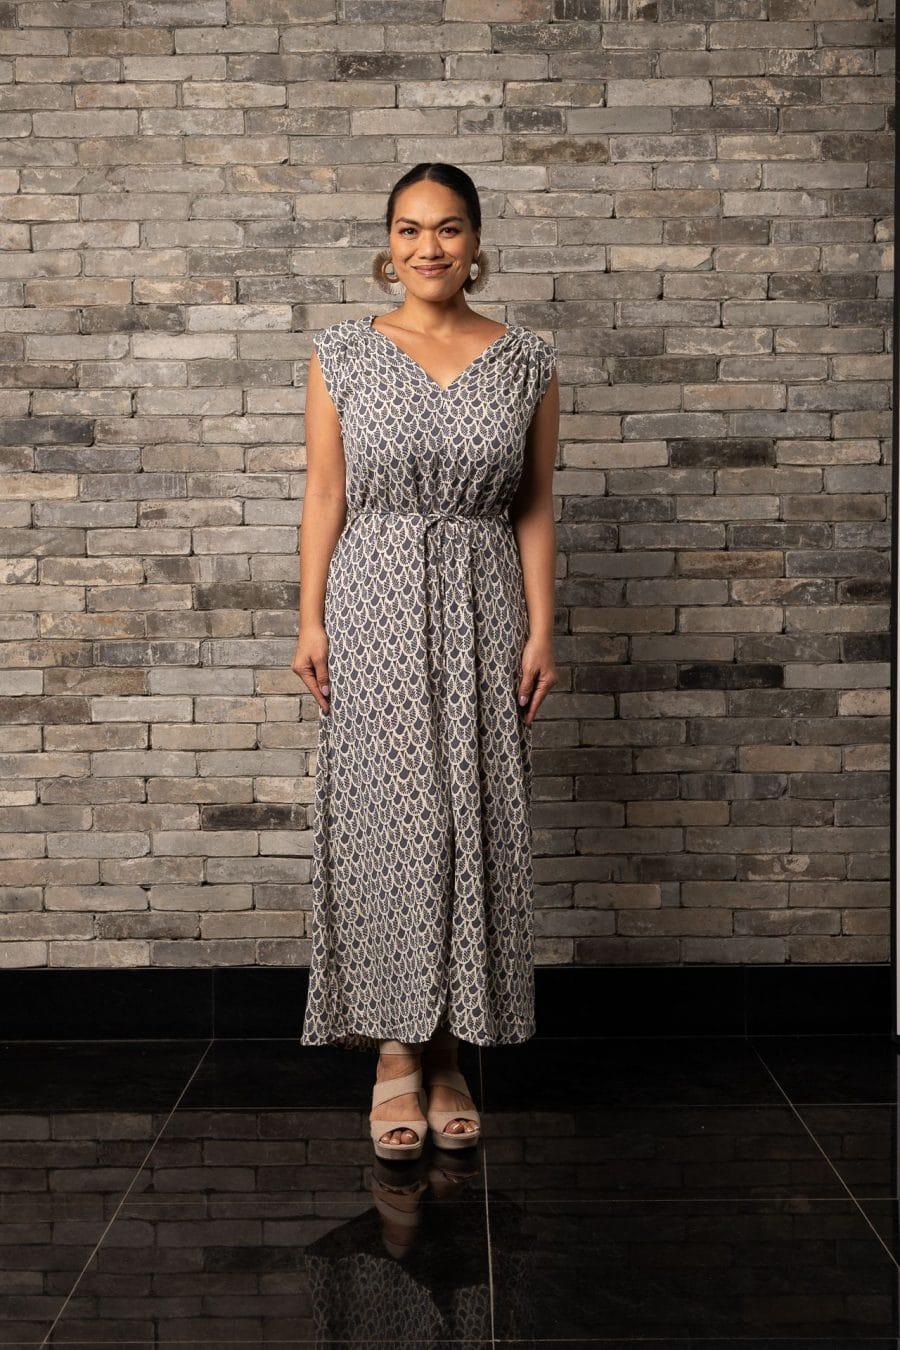 Model wearing Alena Long Dress in Pavement Moonbeam Palulu Pattern - Front View